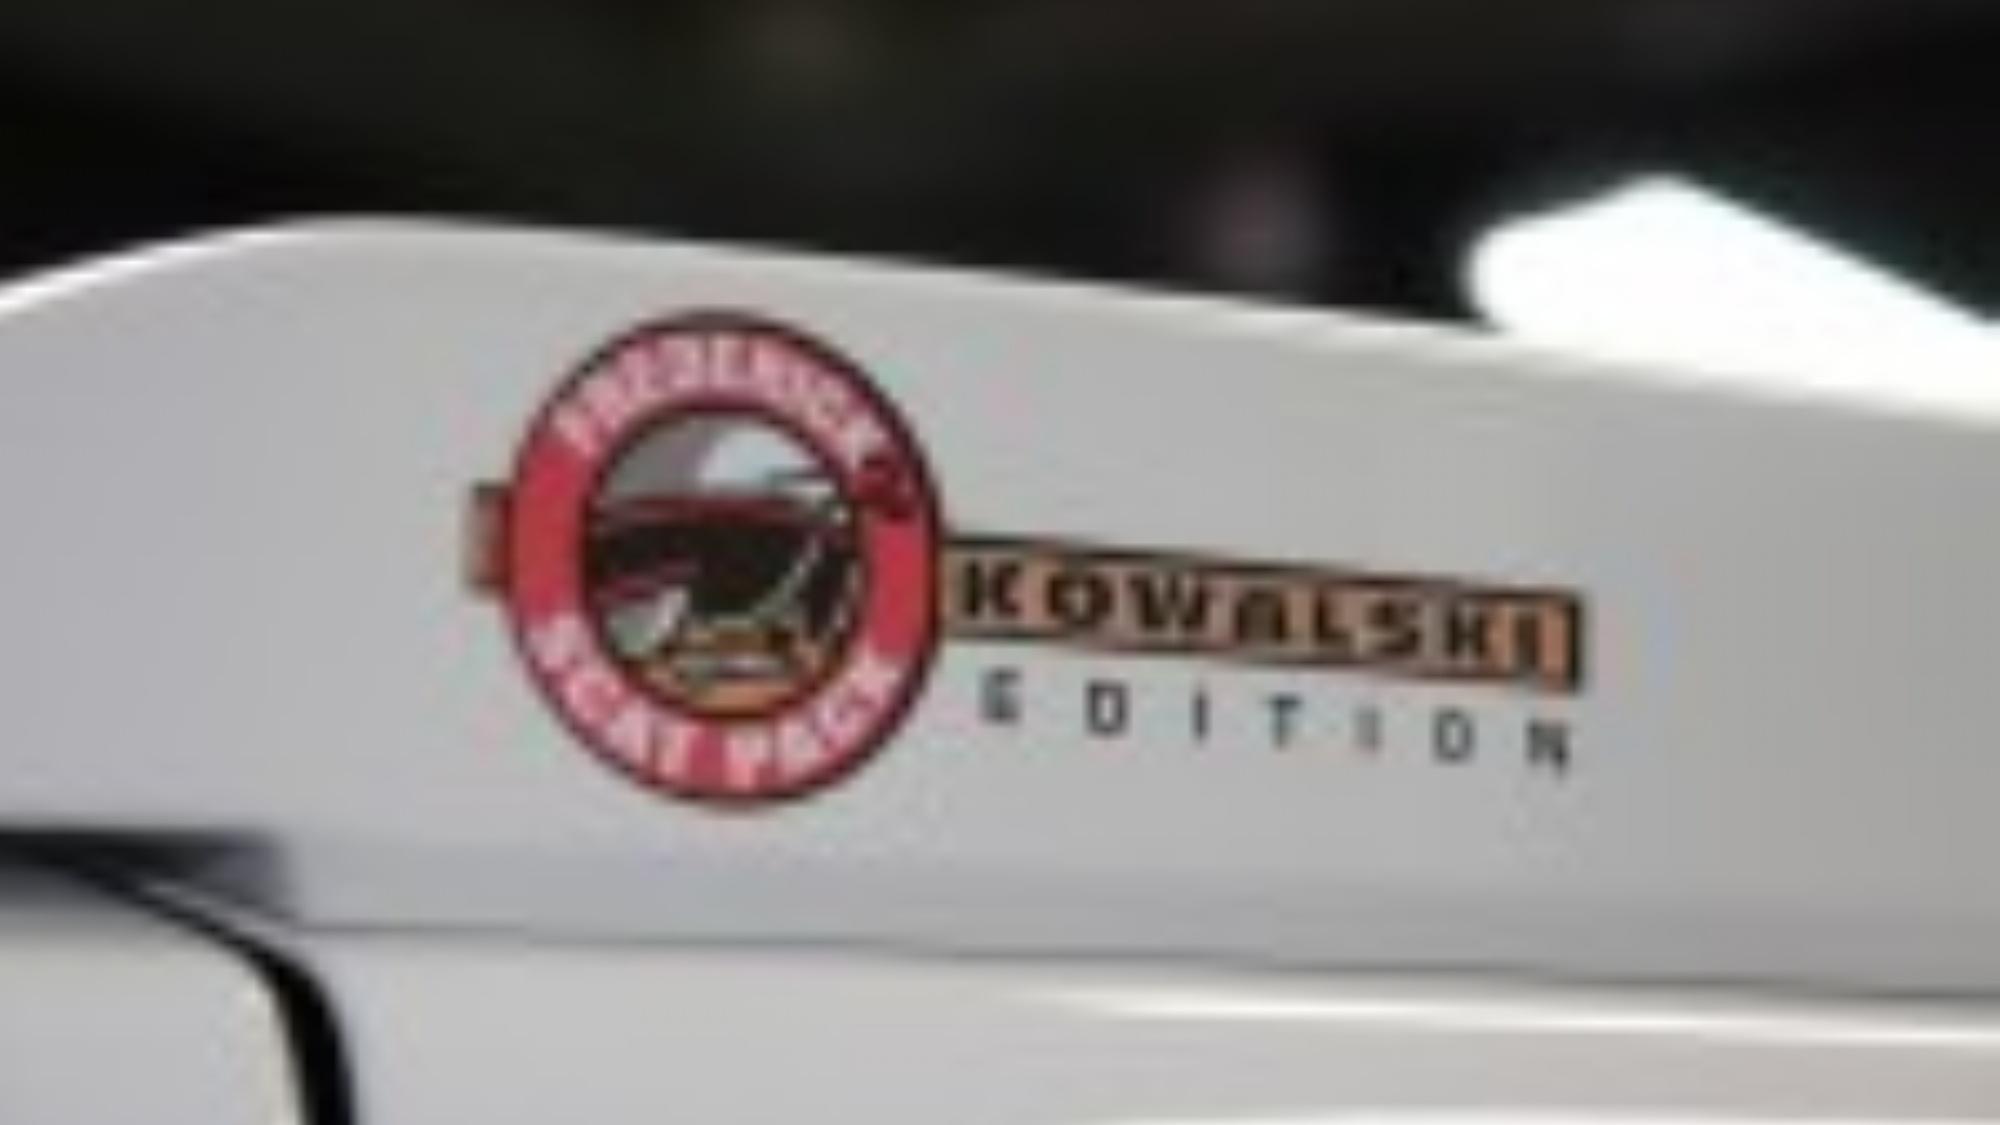 Kowalski Challenger